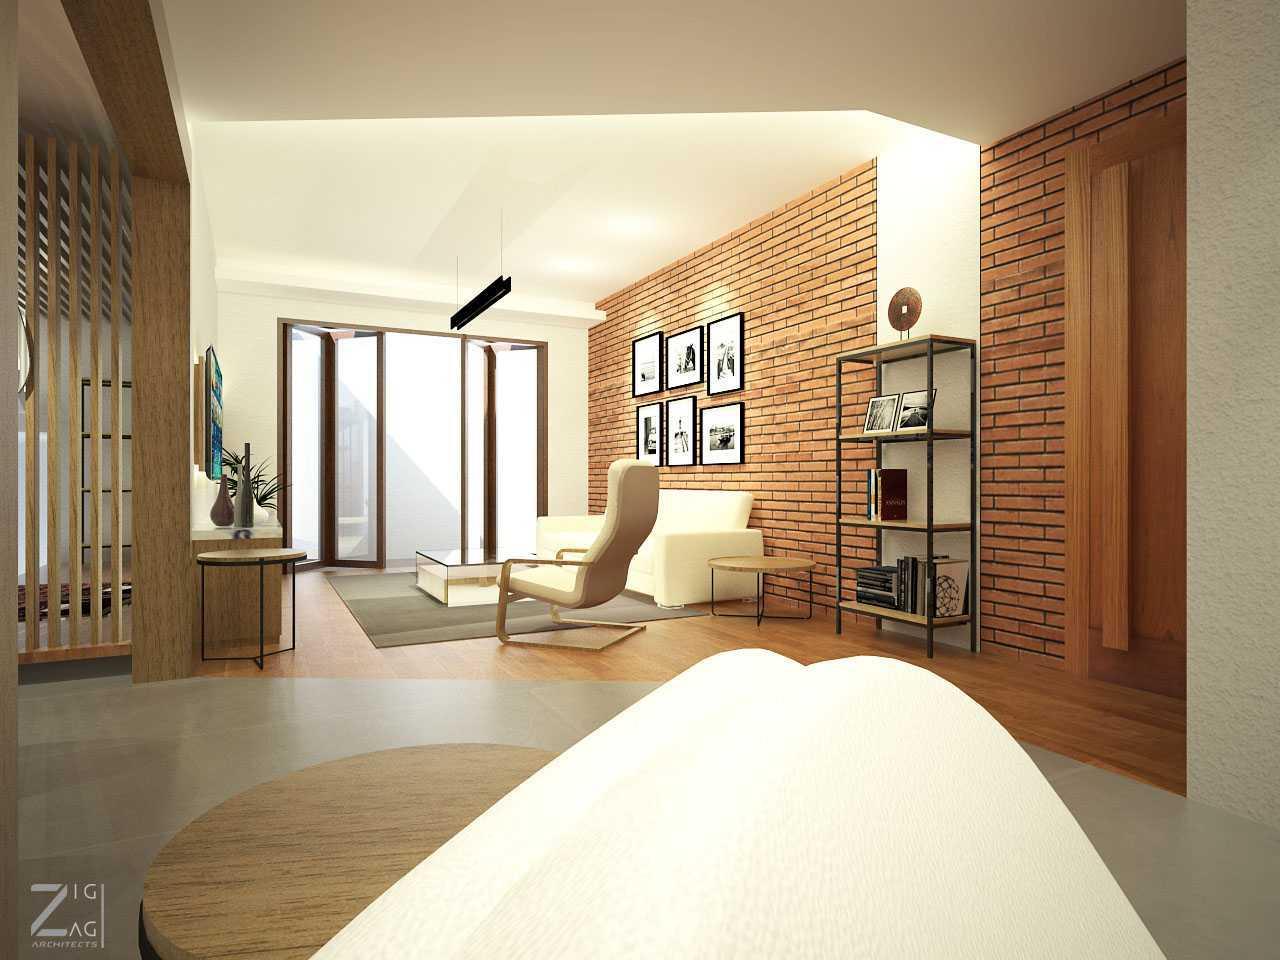 Zigzag Architecture Studio Pulomas House Daerah Khusus Ibukota Jakarta, Indonesia  Living-Room-View02  37607